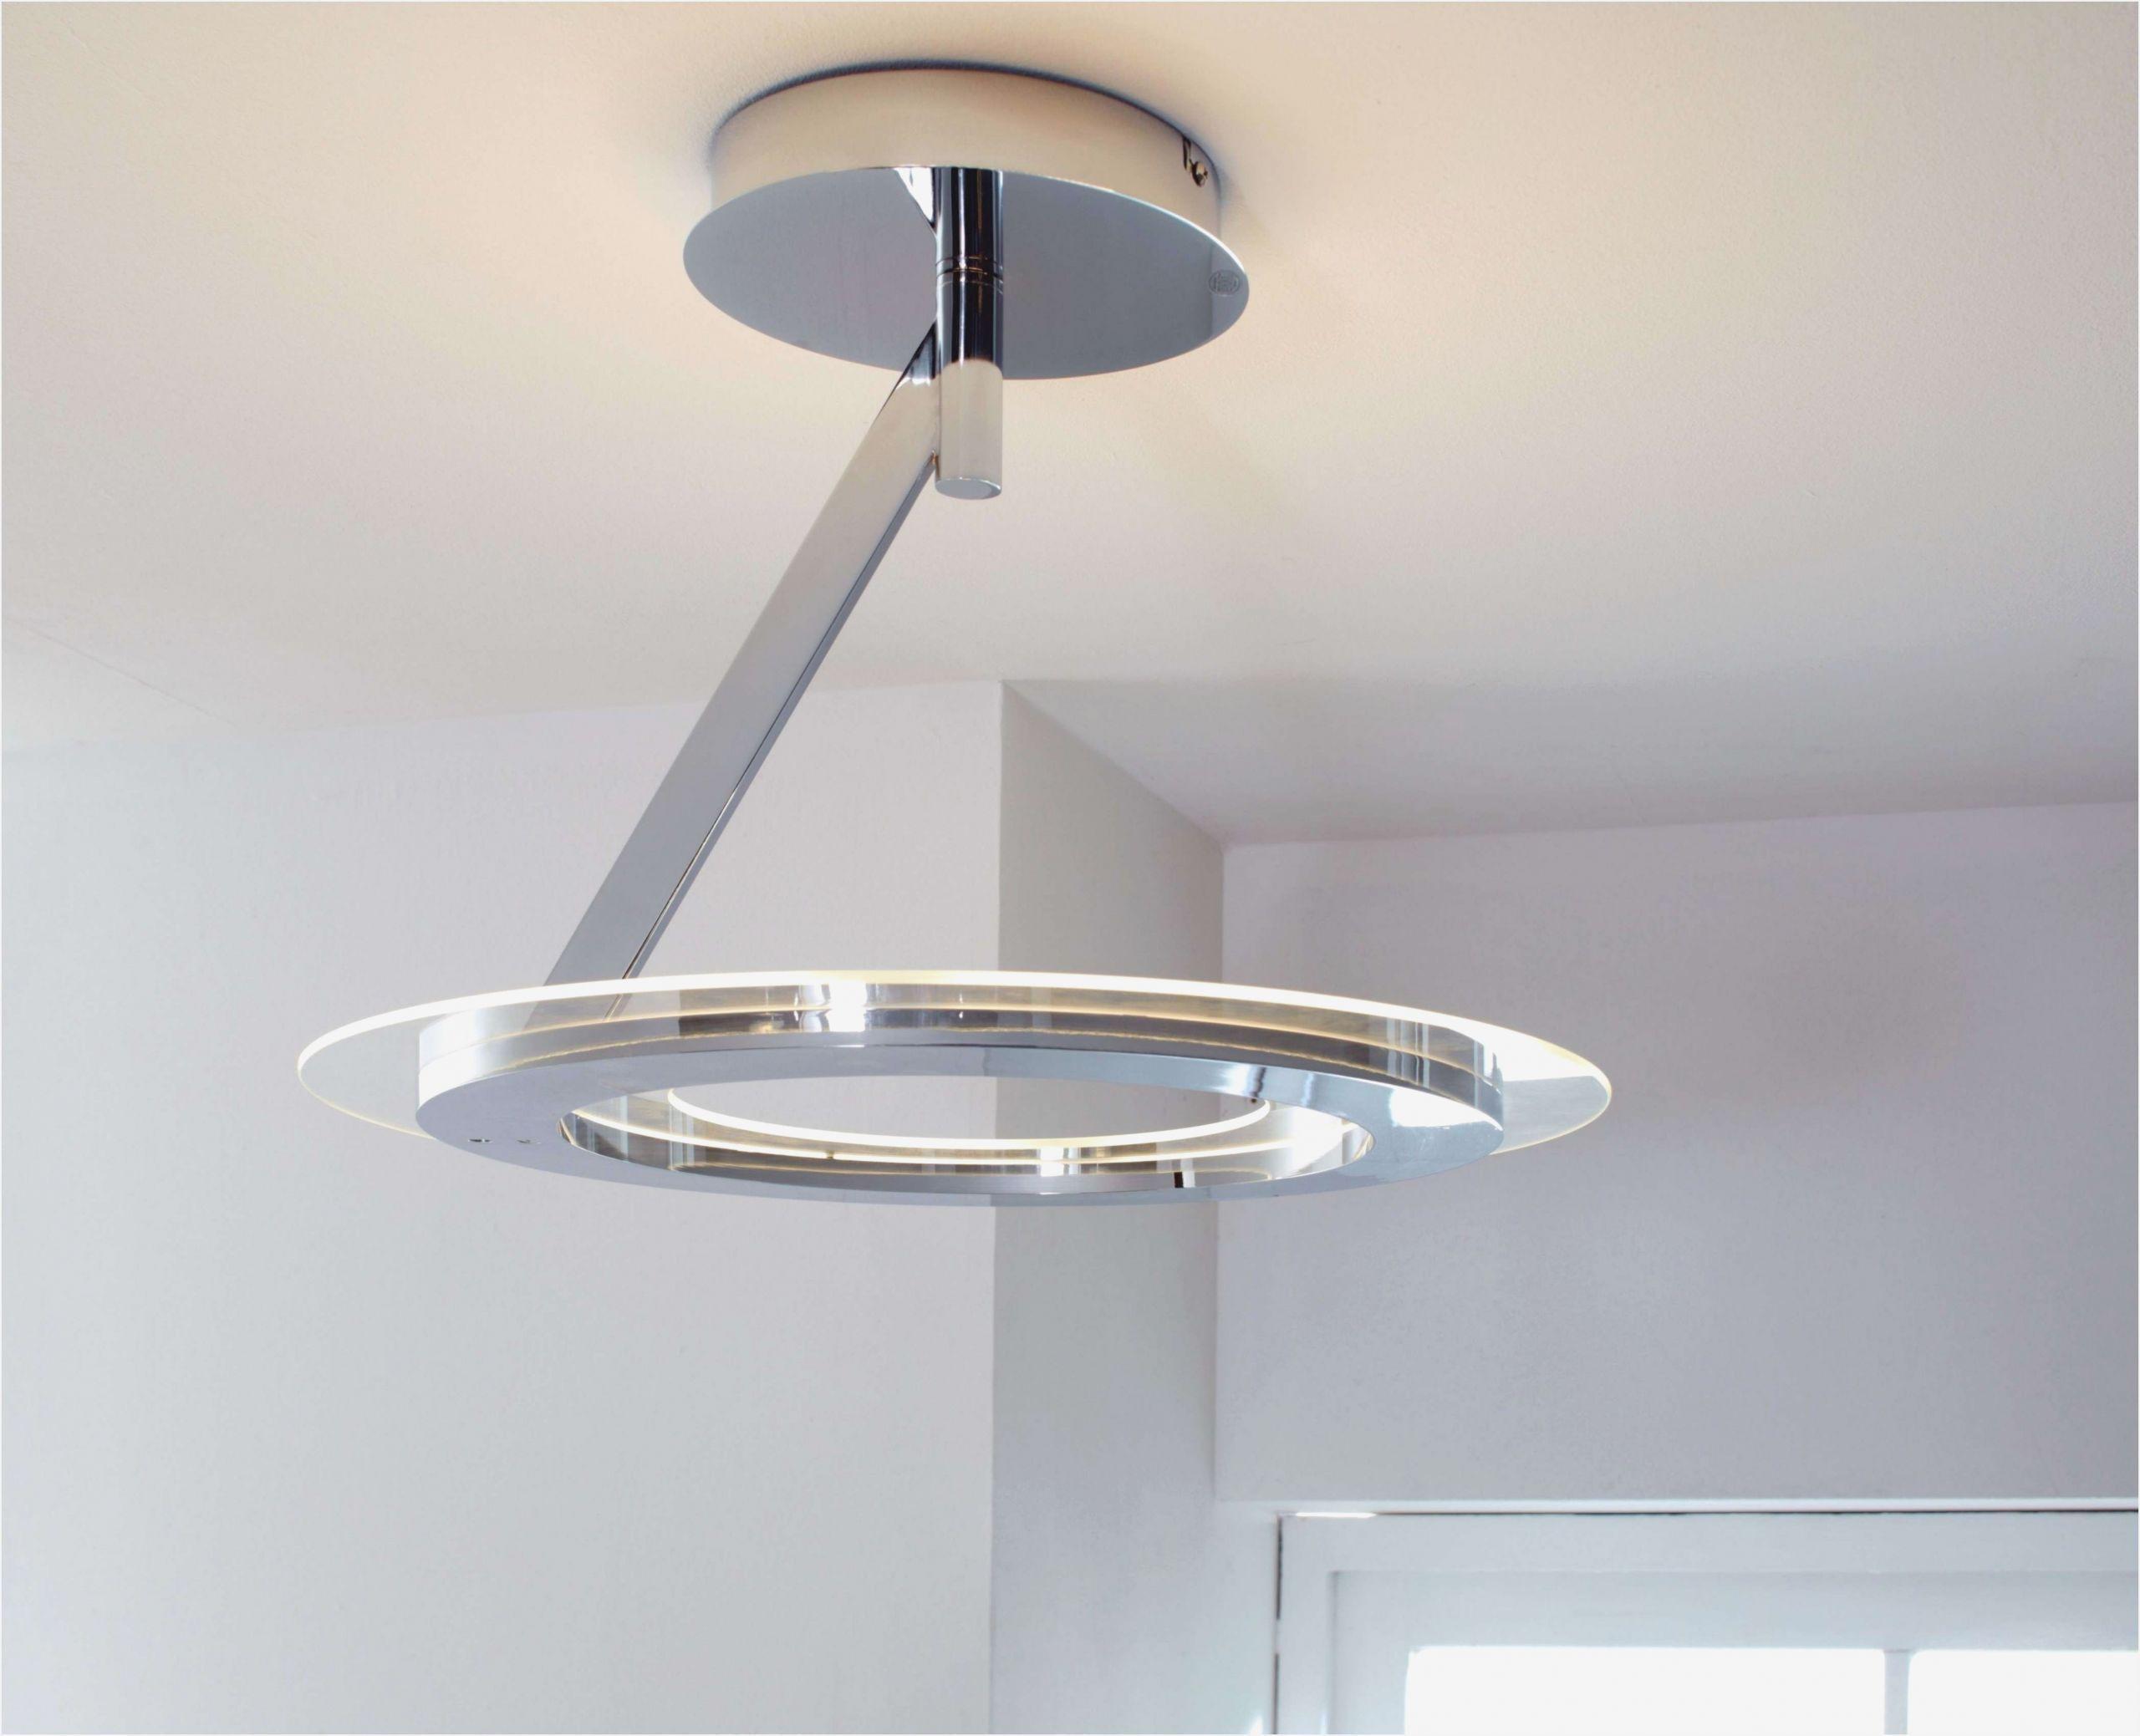 Ikea Badezimmer Lampe Wand